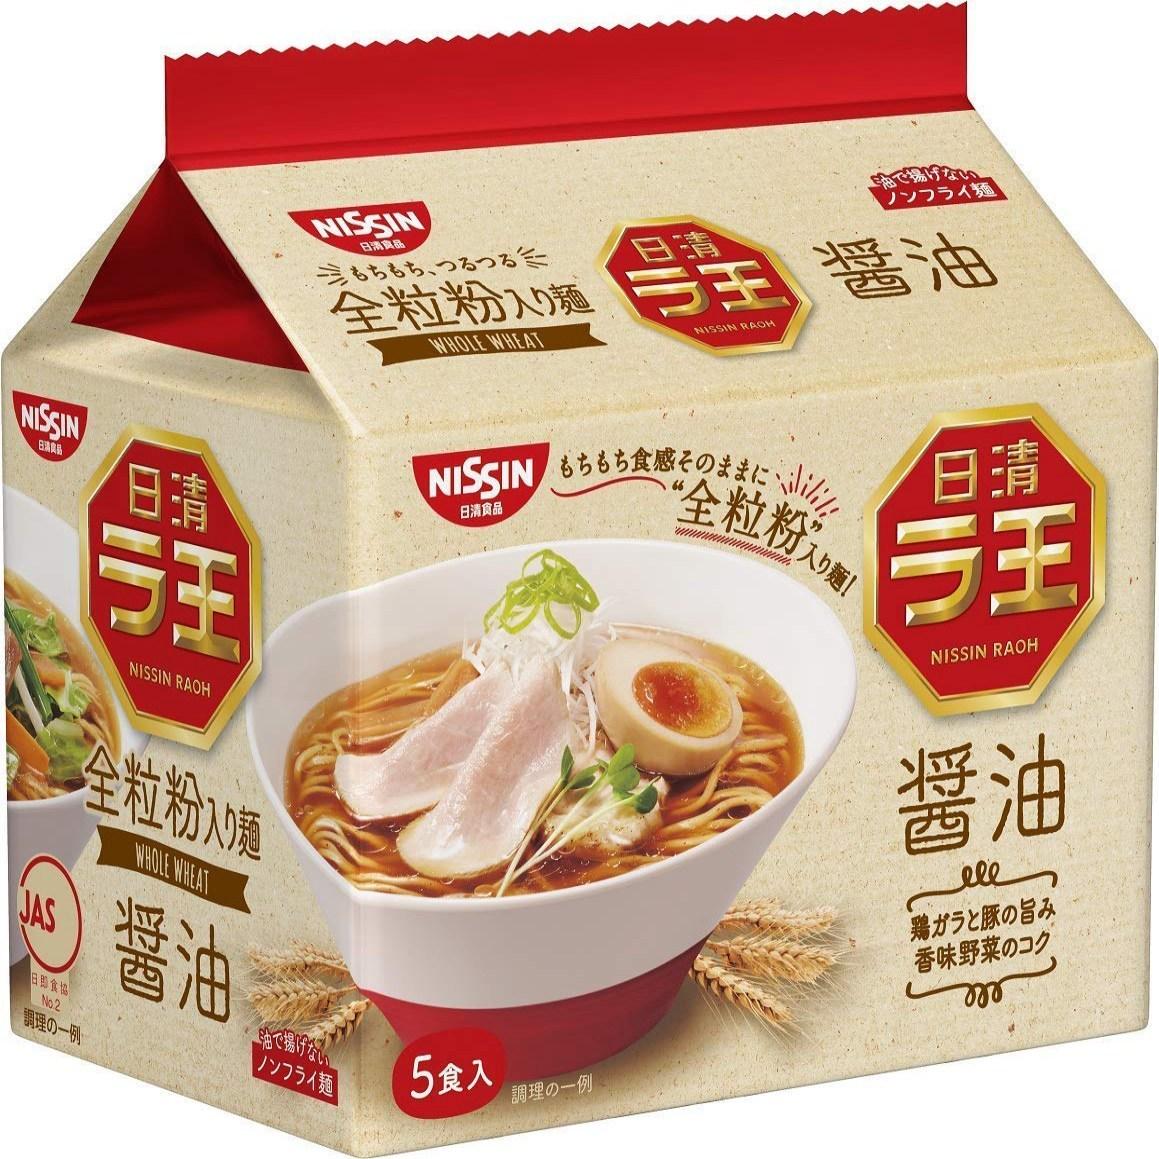 Nissin - Raoh Japanese Instant Ramen Noodles Soy Sauce Taste 17.1oz (For 5 Bowls) Nissin-Raoh 일본식 인스, 1